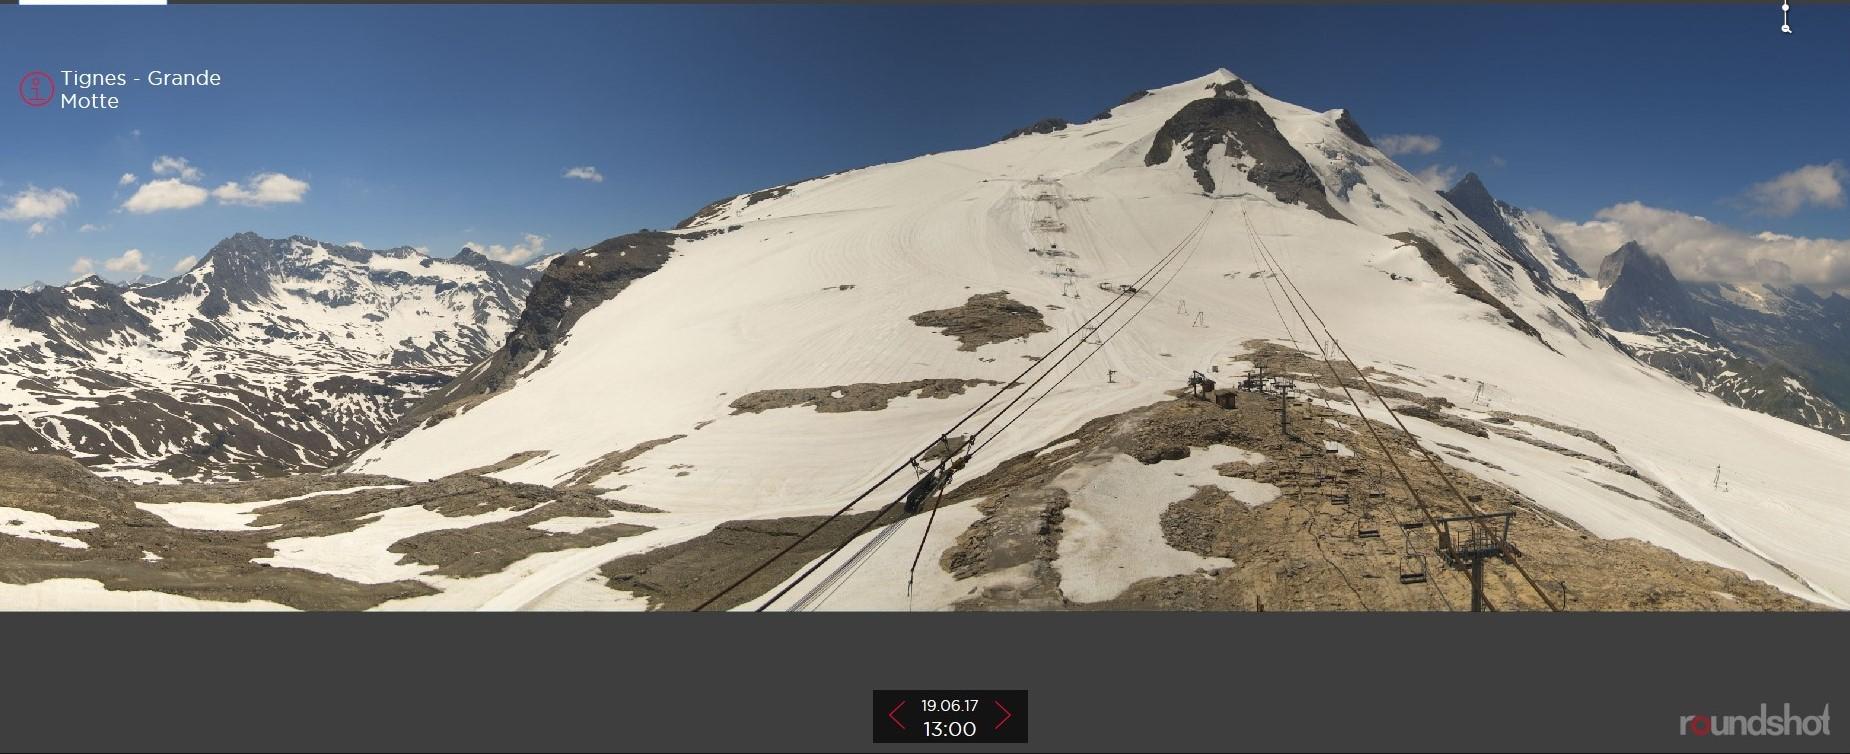 Nowcasting nivoglaciale Alpi estate 2018-grande-motte-19.06.17.jpg